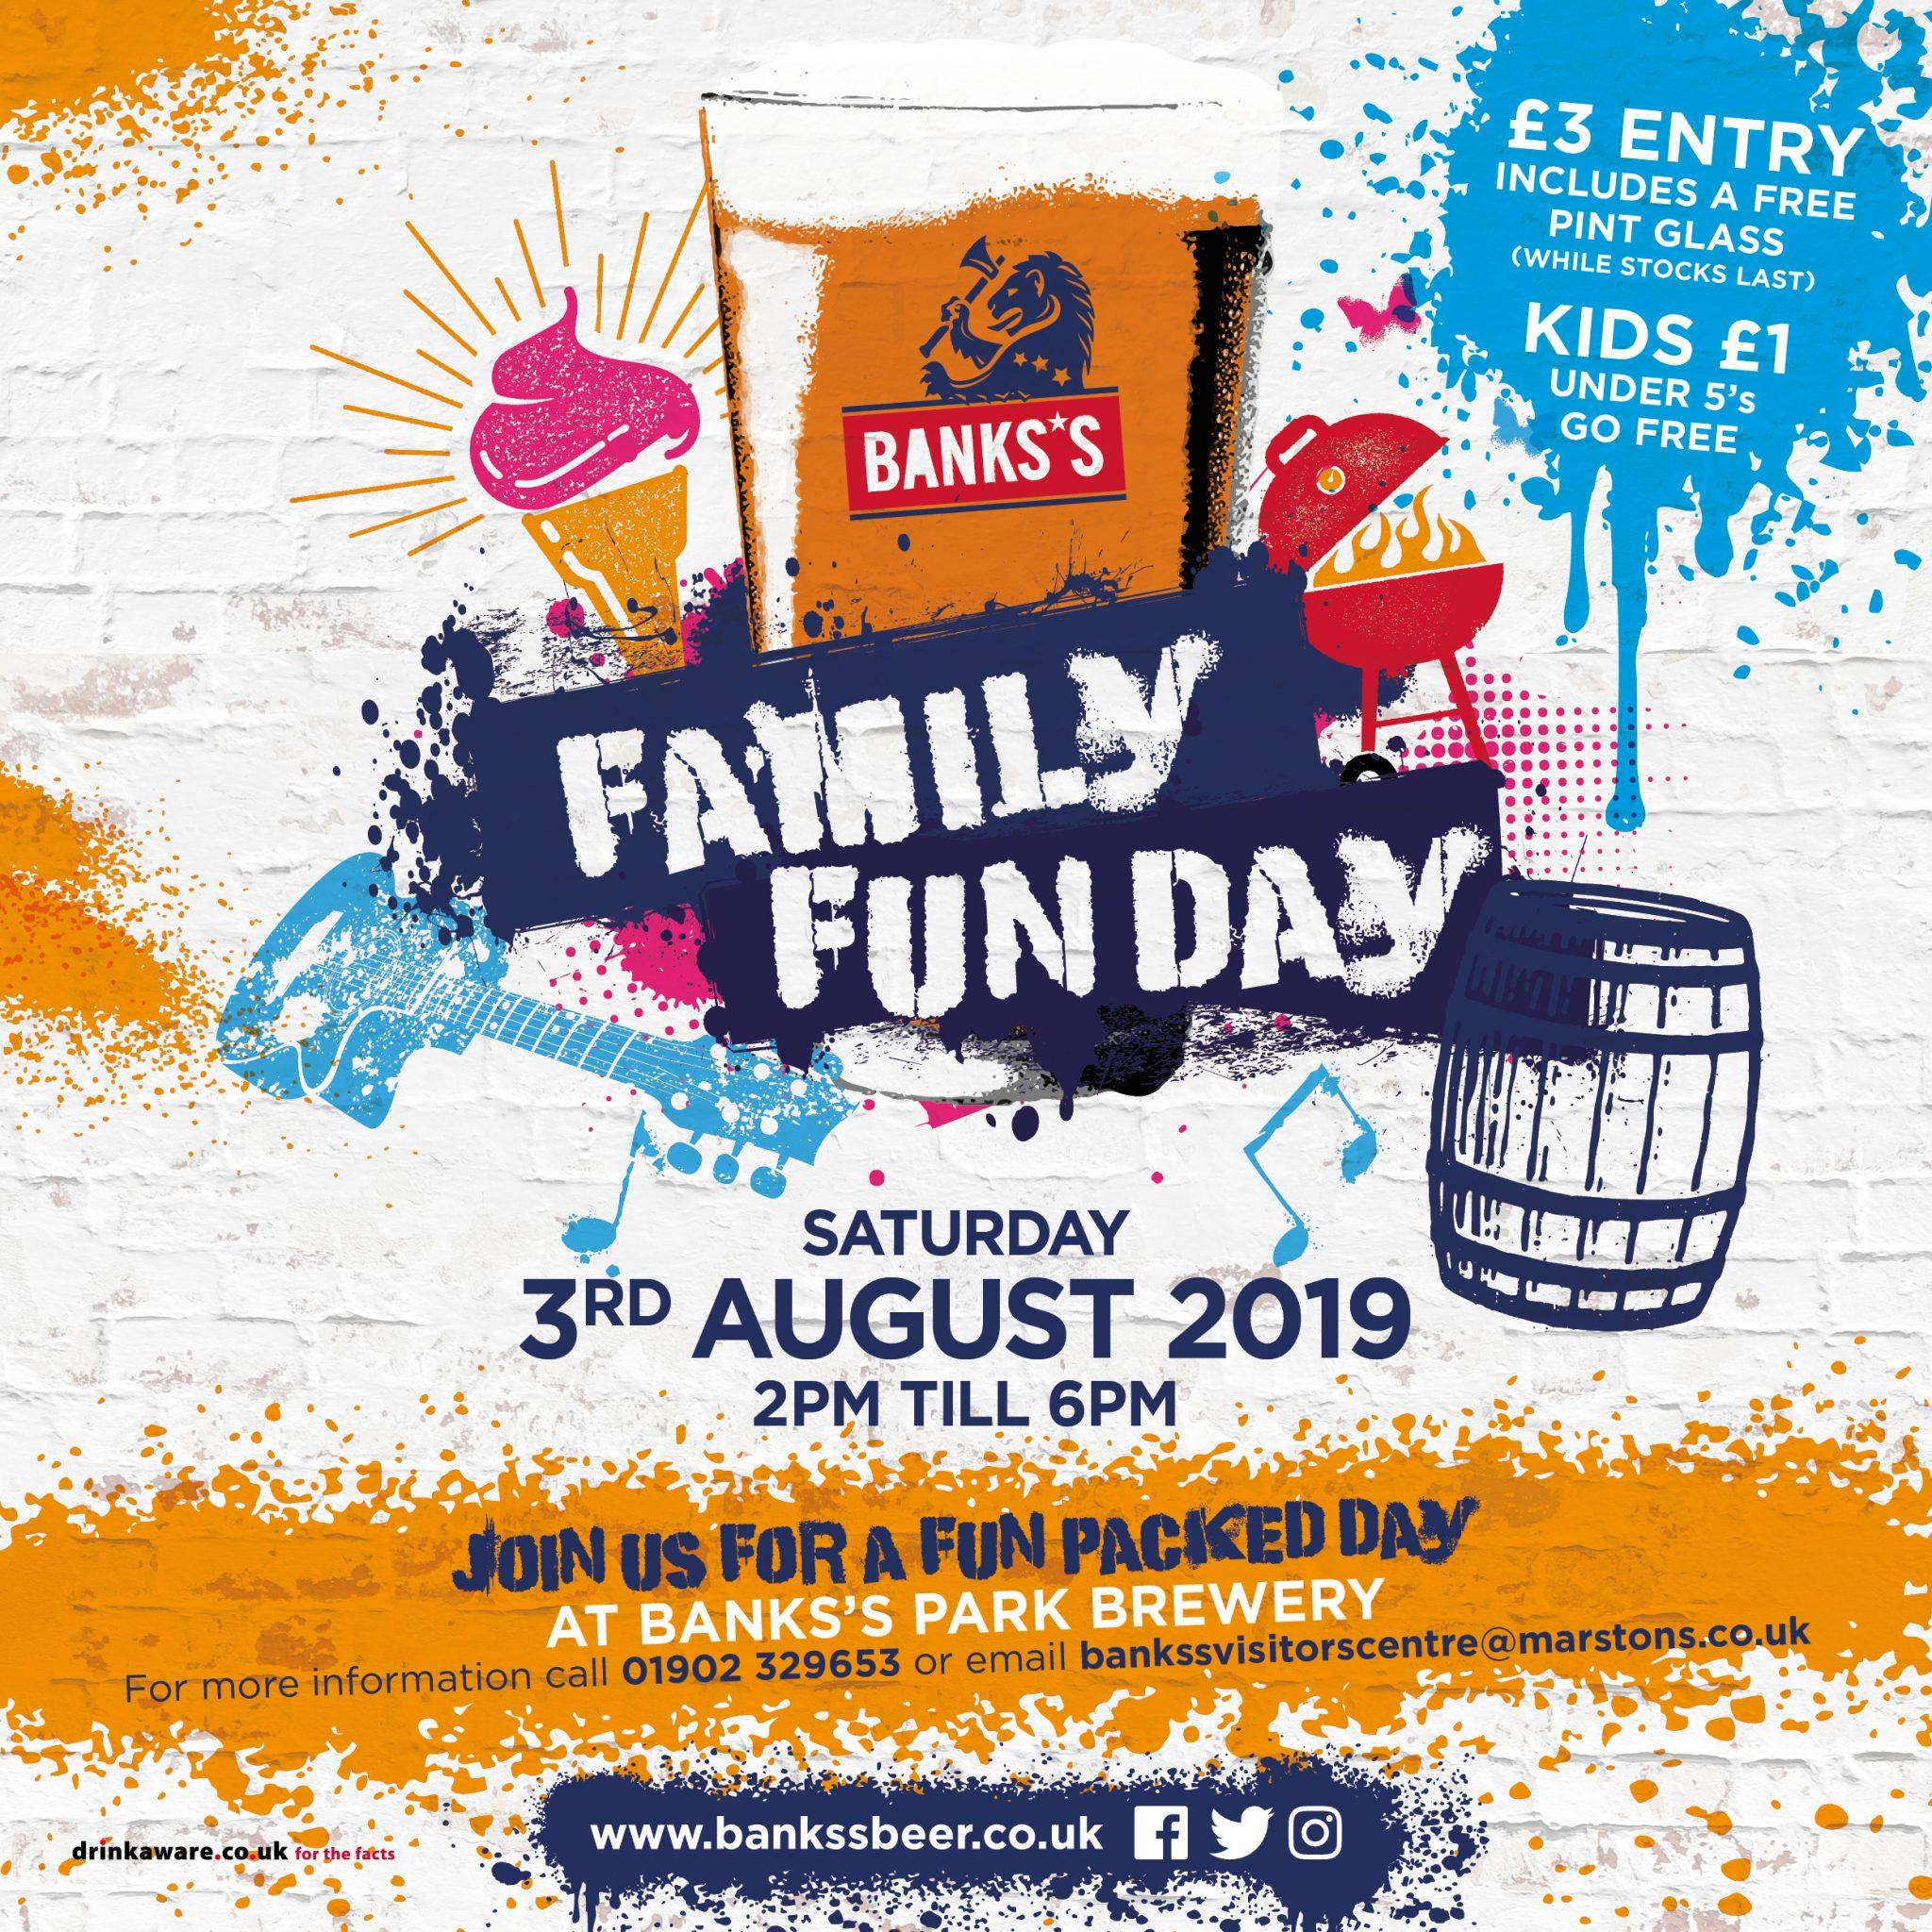 Banks's Family Fun Day